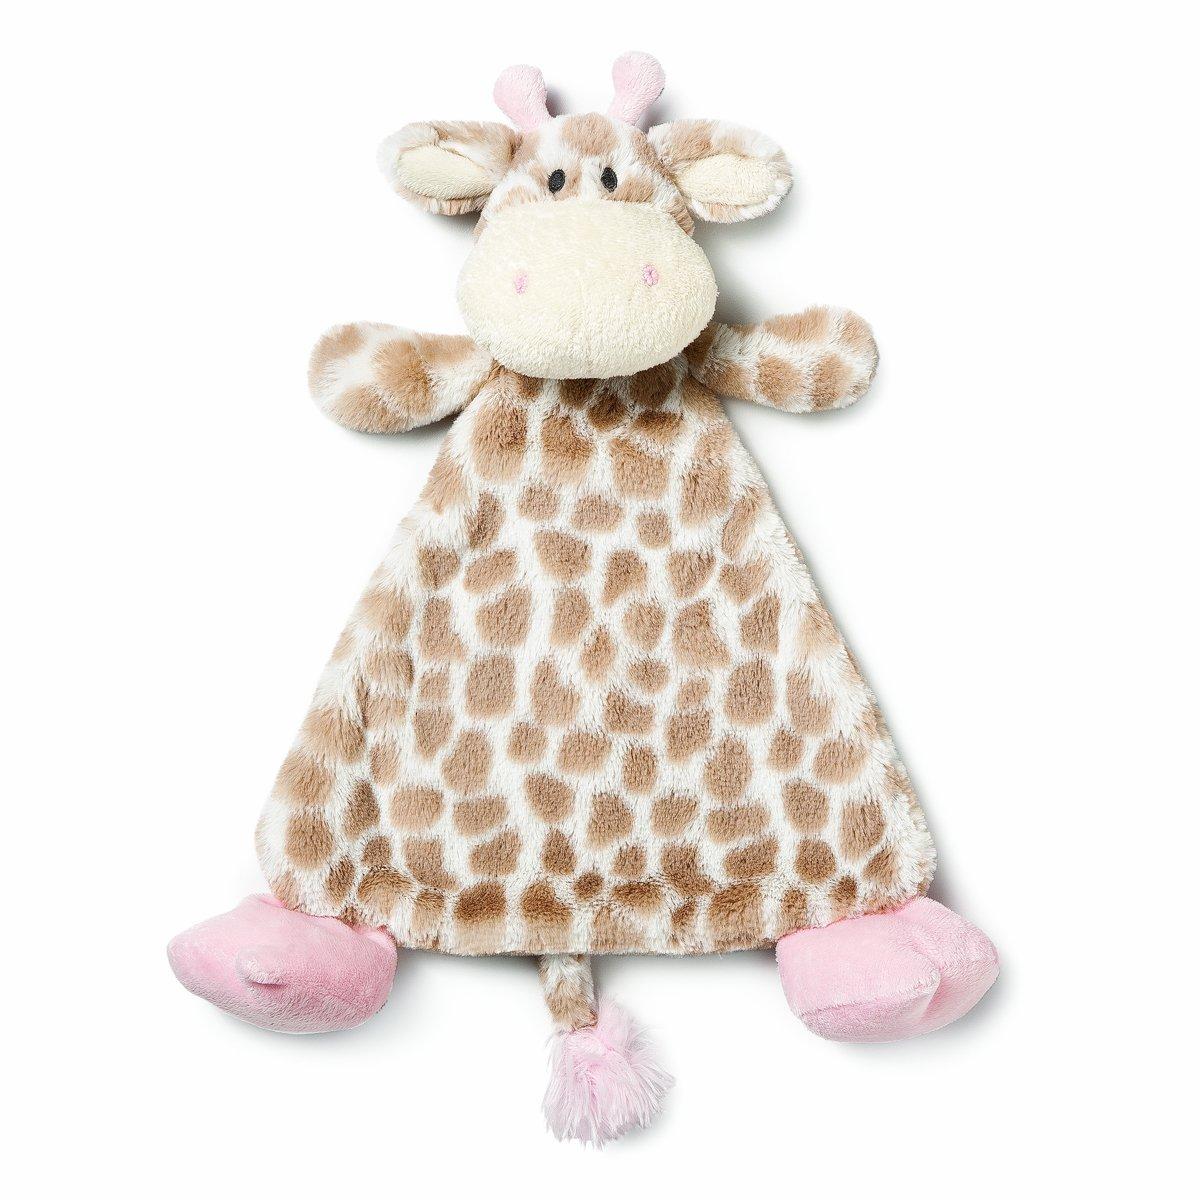 Nat and Jules Blankie Rattle Plush Toy, Sadie Giraffe